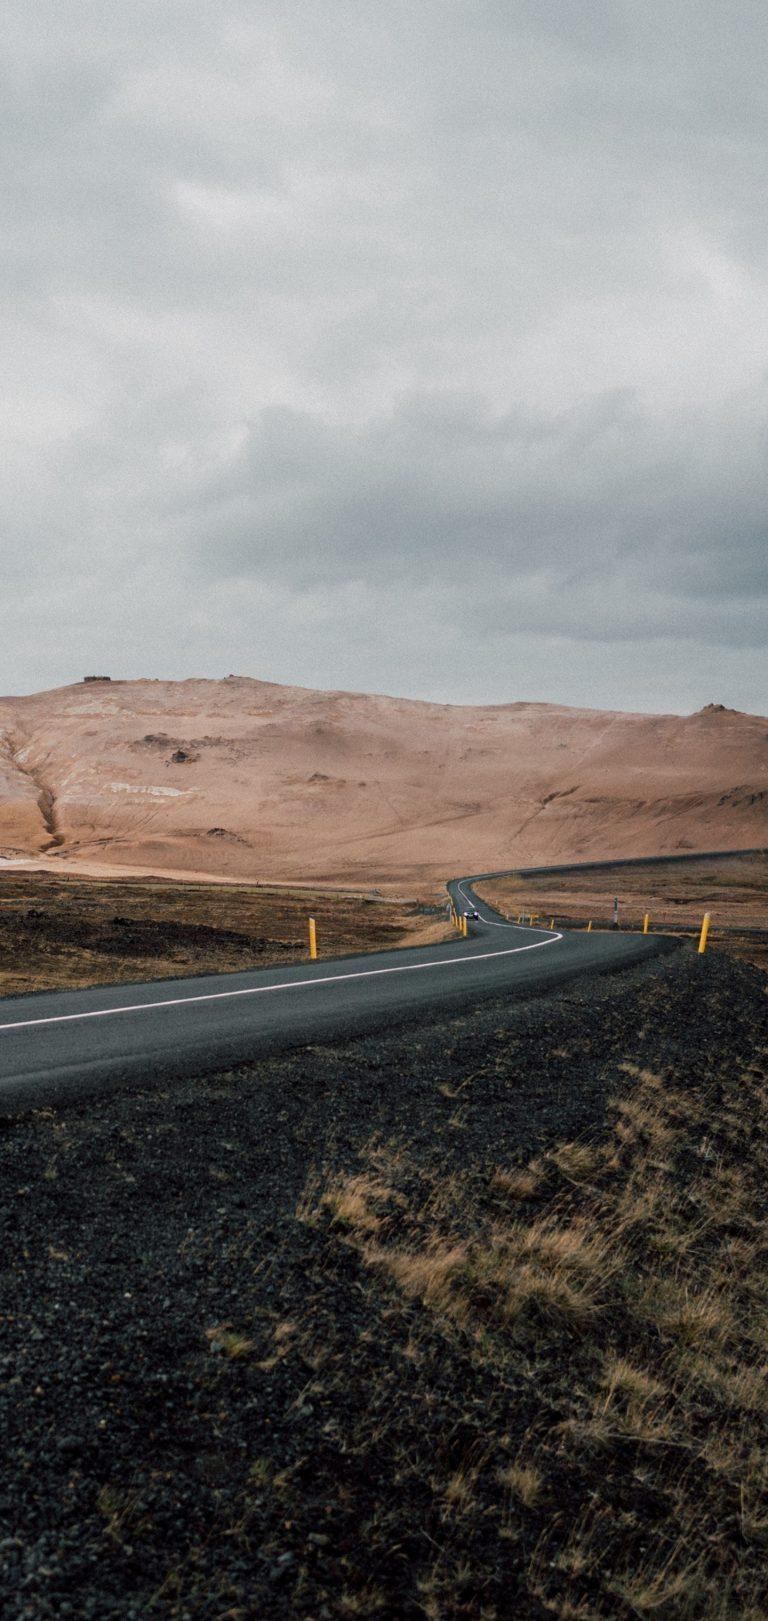 Road Asphalt Mountains Marking Wallpaper 1440x3040 768x1621